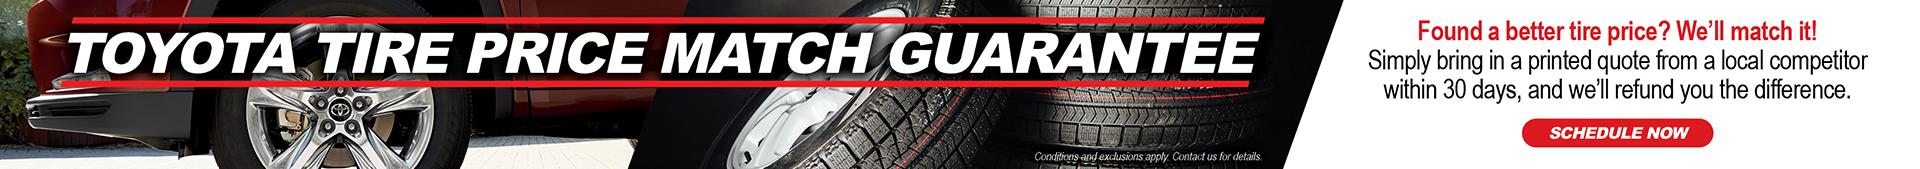 Tire Center Price Match